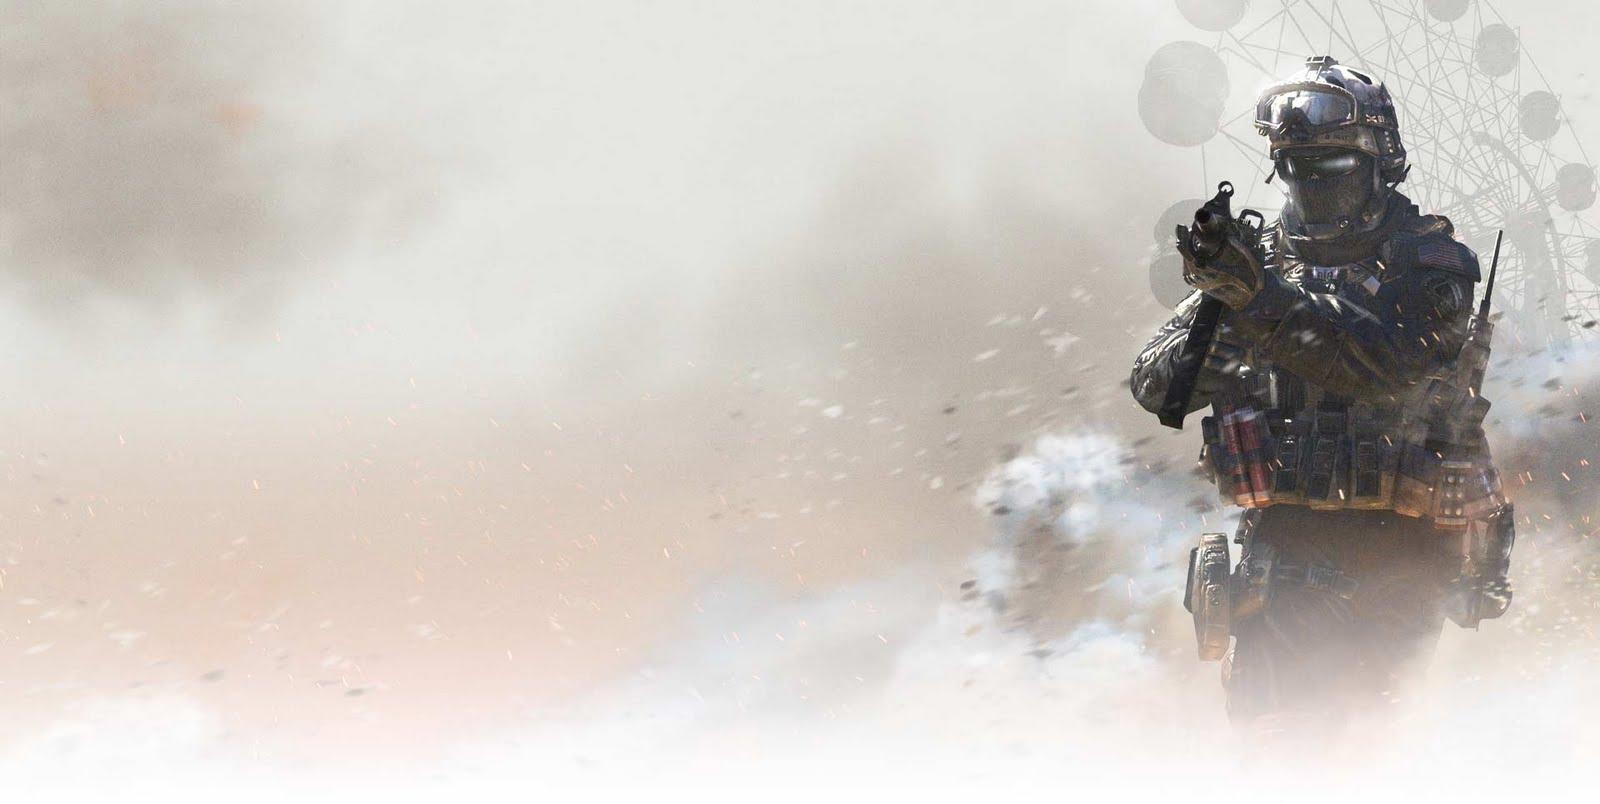 http://4.bp.blogspot.com/-sphYs6GXRS4/TfGBg9Ir-ZI/AAAAAAAAAl0/S0Q3sY25LWU/s1600/Modern+Warfare+2+Call+of+duty+resurgence+Wallpaper.jpg